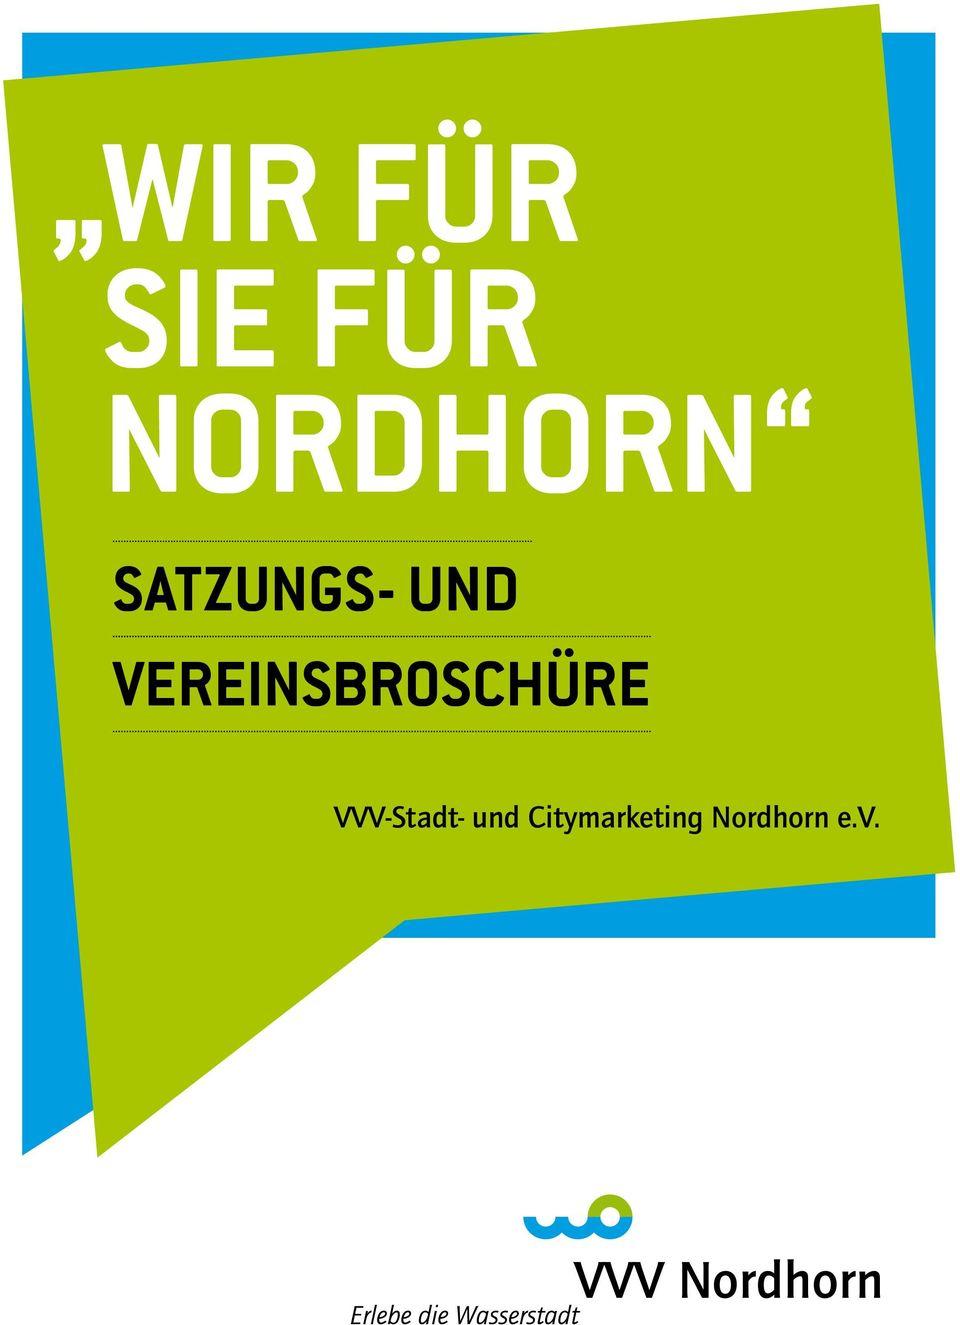 wir fur sie fur nordhorn pdf free download